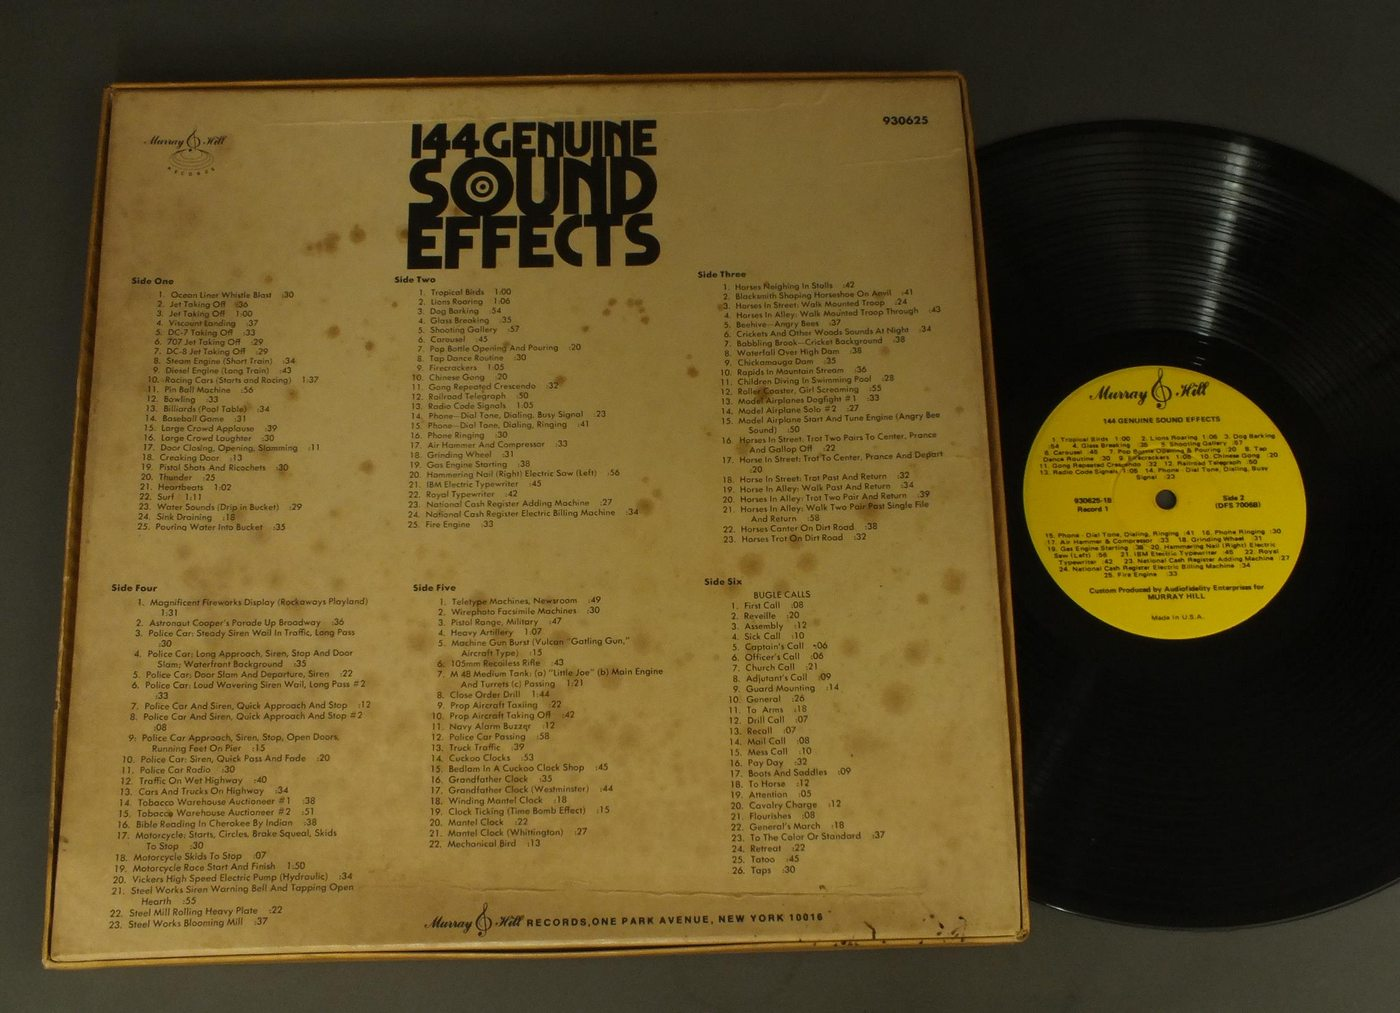 Details about SOUND EFFECT/144 GENUINE SOUND EFFECTS 3LP BOX US 930625